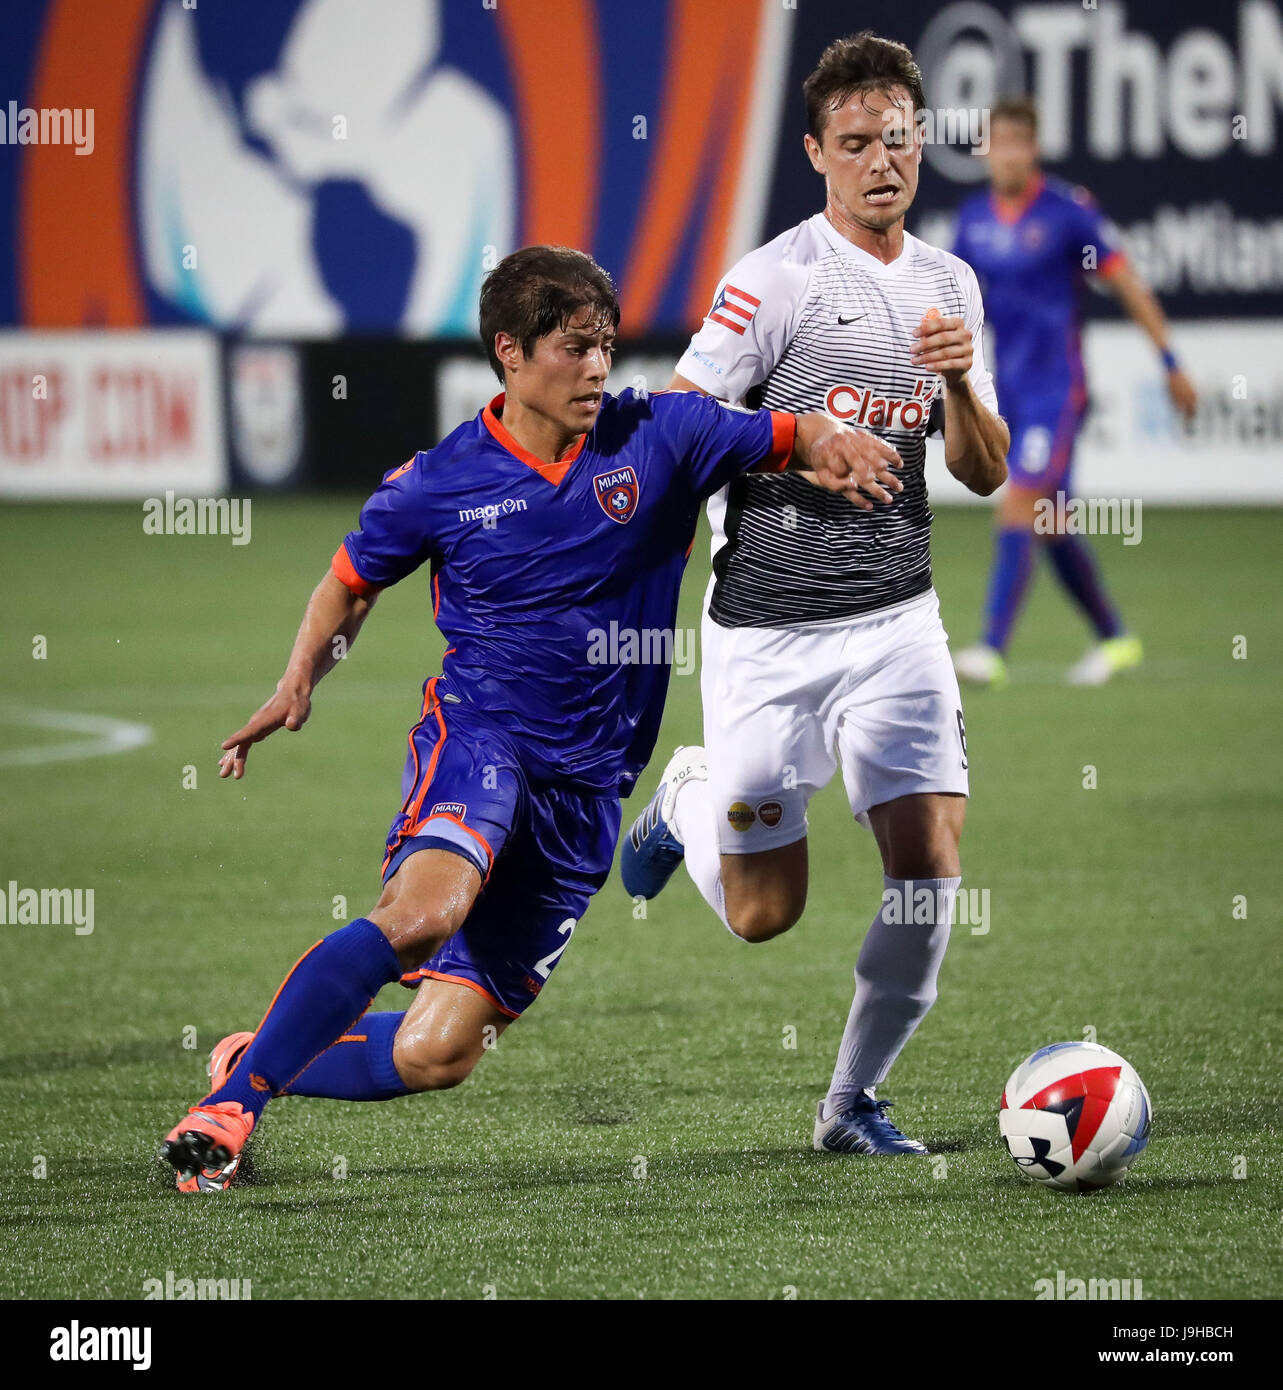 May 27, 2017: Miami FC midfielder Calvin Rezende (21) battles for ball possession with Puerto Rico FC midfielder - Stock Image